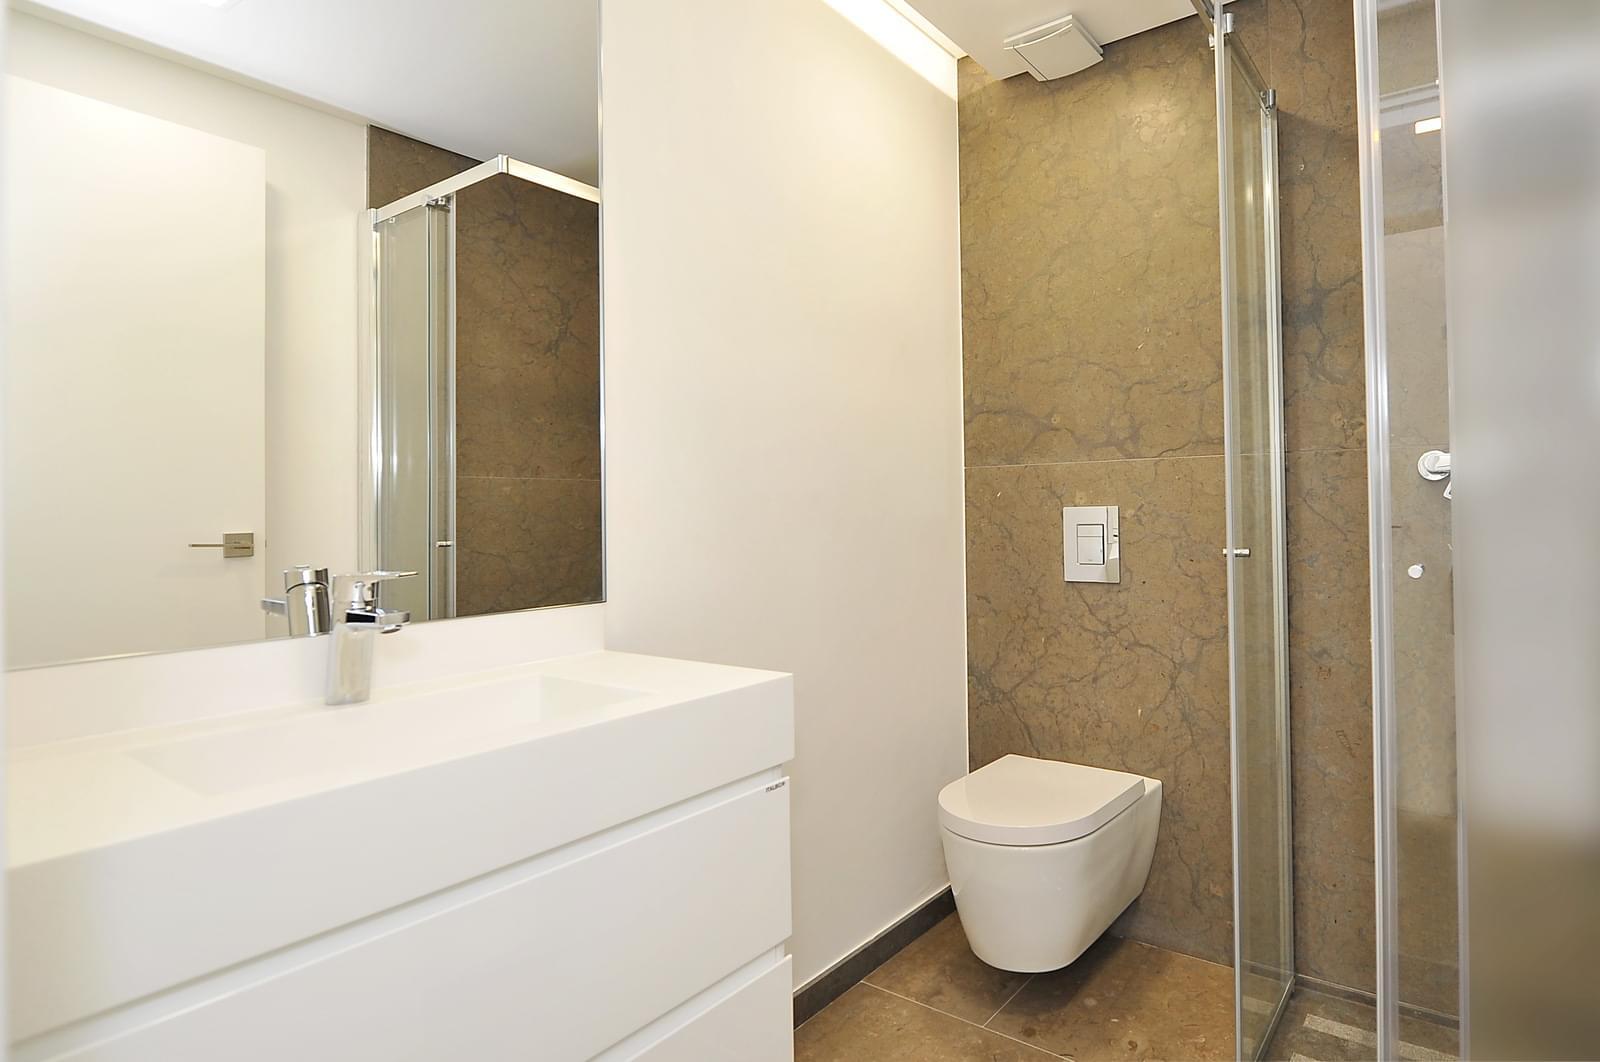 pf18989-apartamento-t4-oeiras-334c2f94-dab6-4d46-b3da-a28119457db9